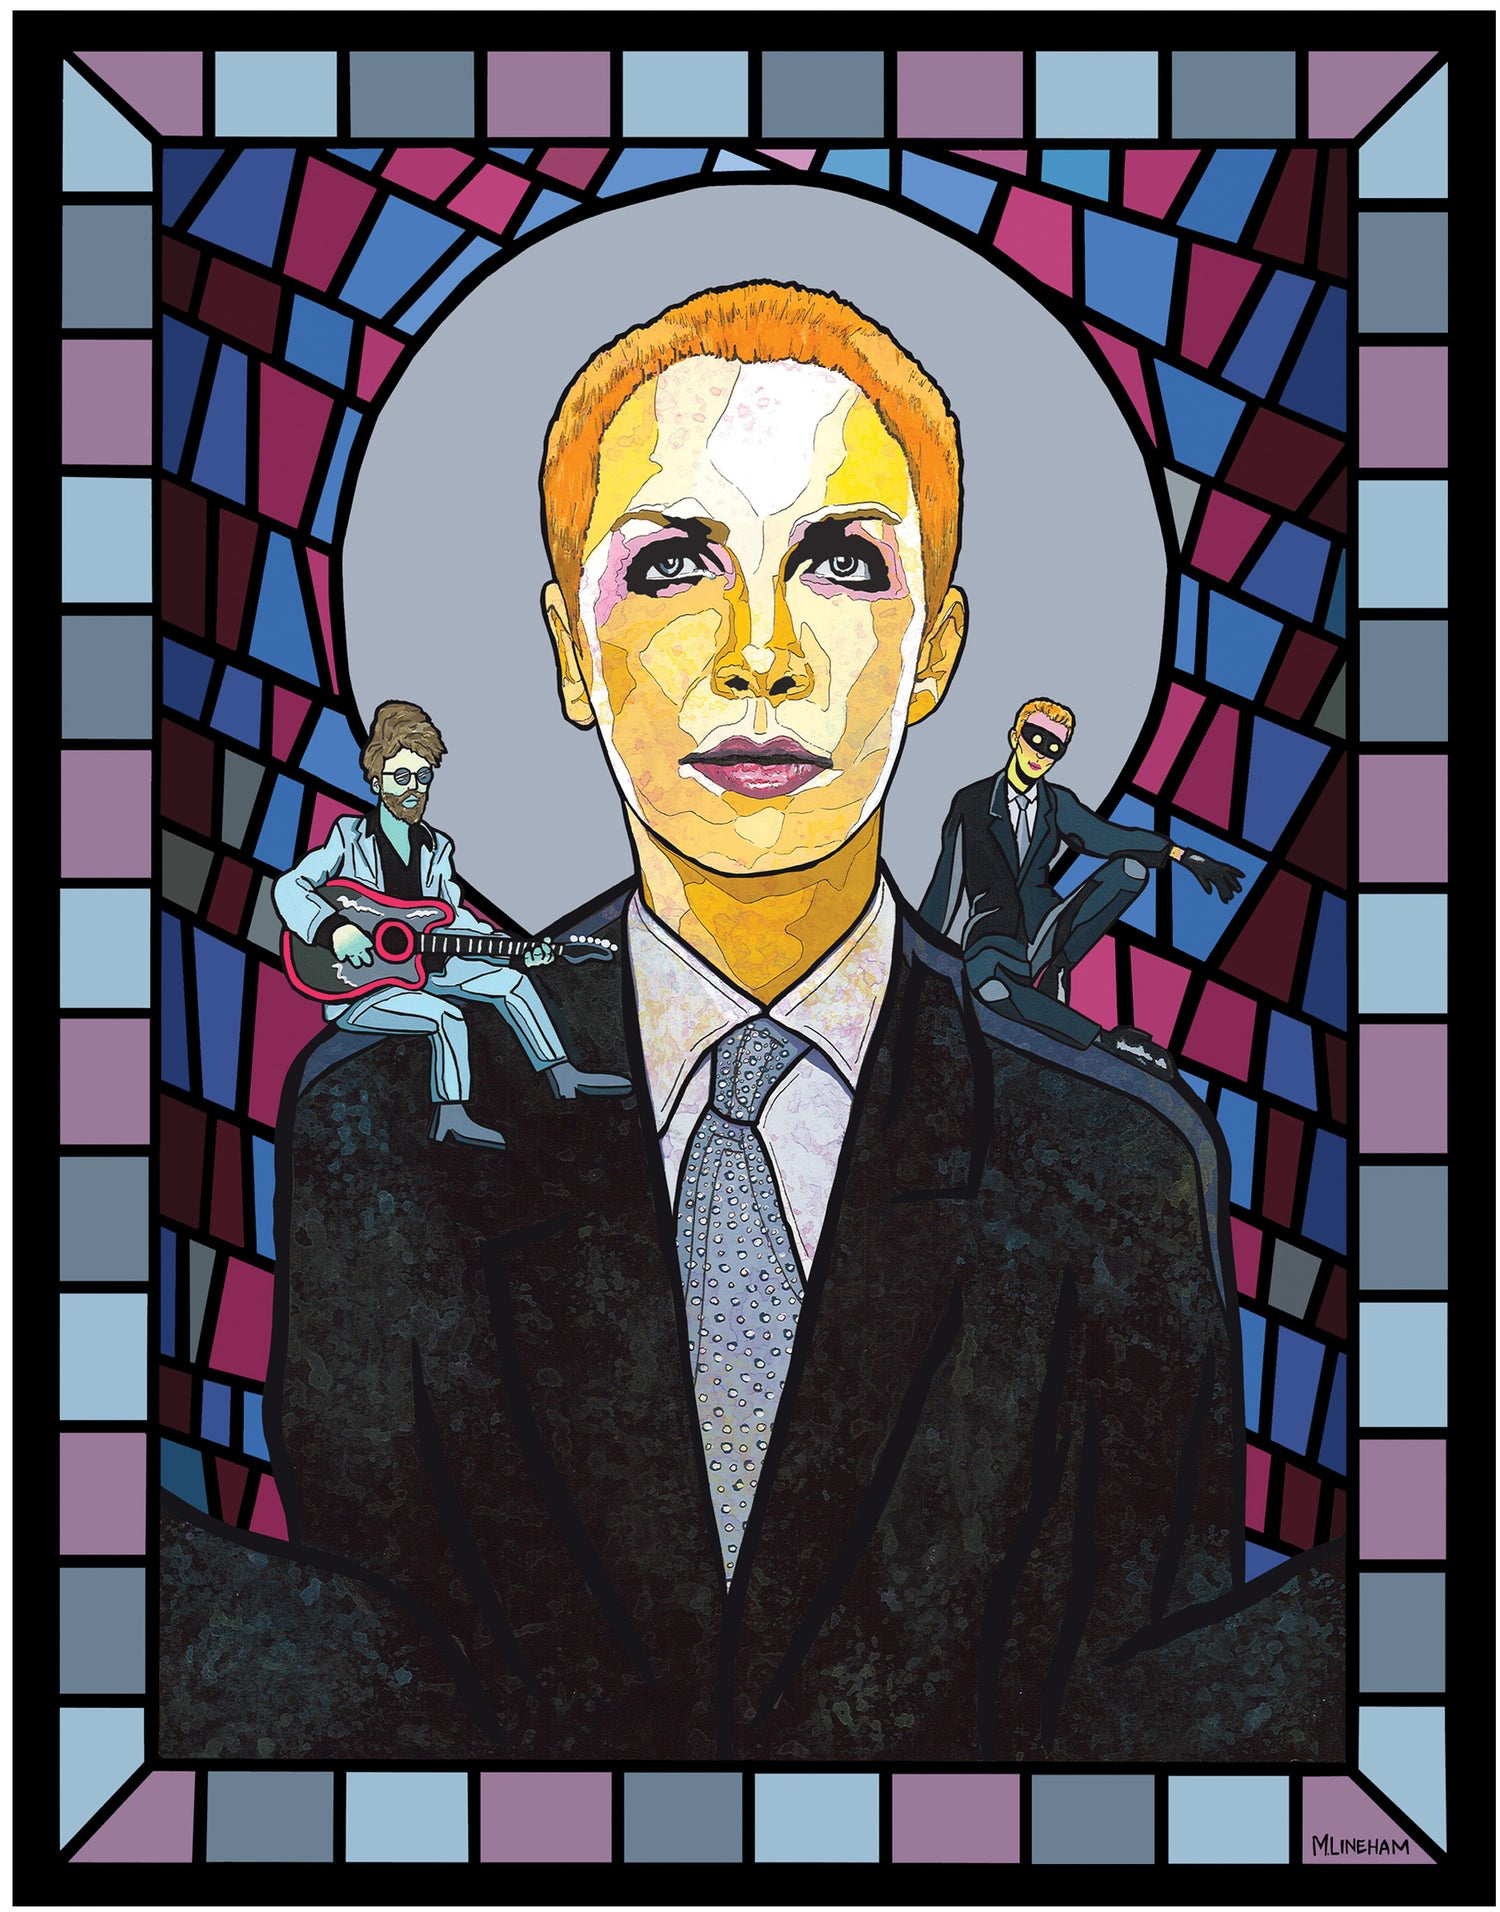 Image of Saint Annie Lennox (Eurythmics)